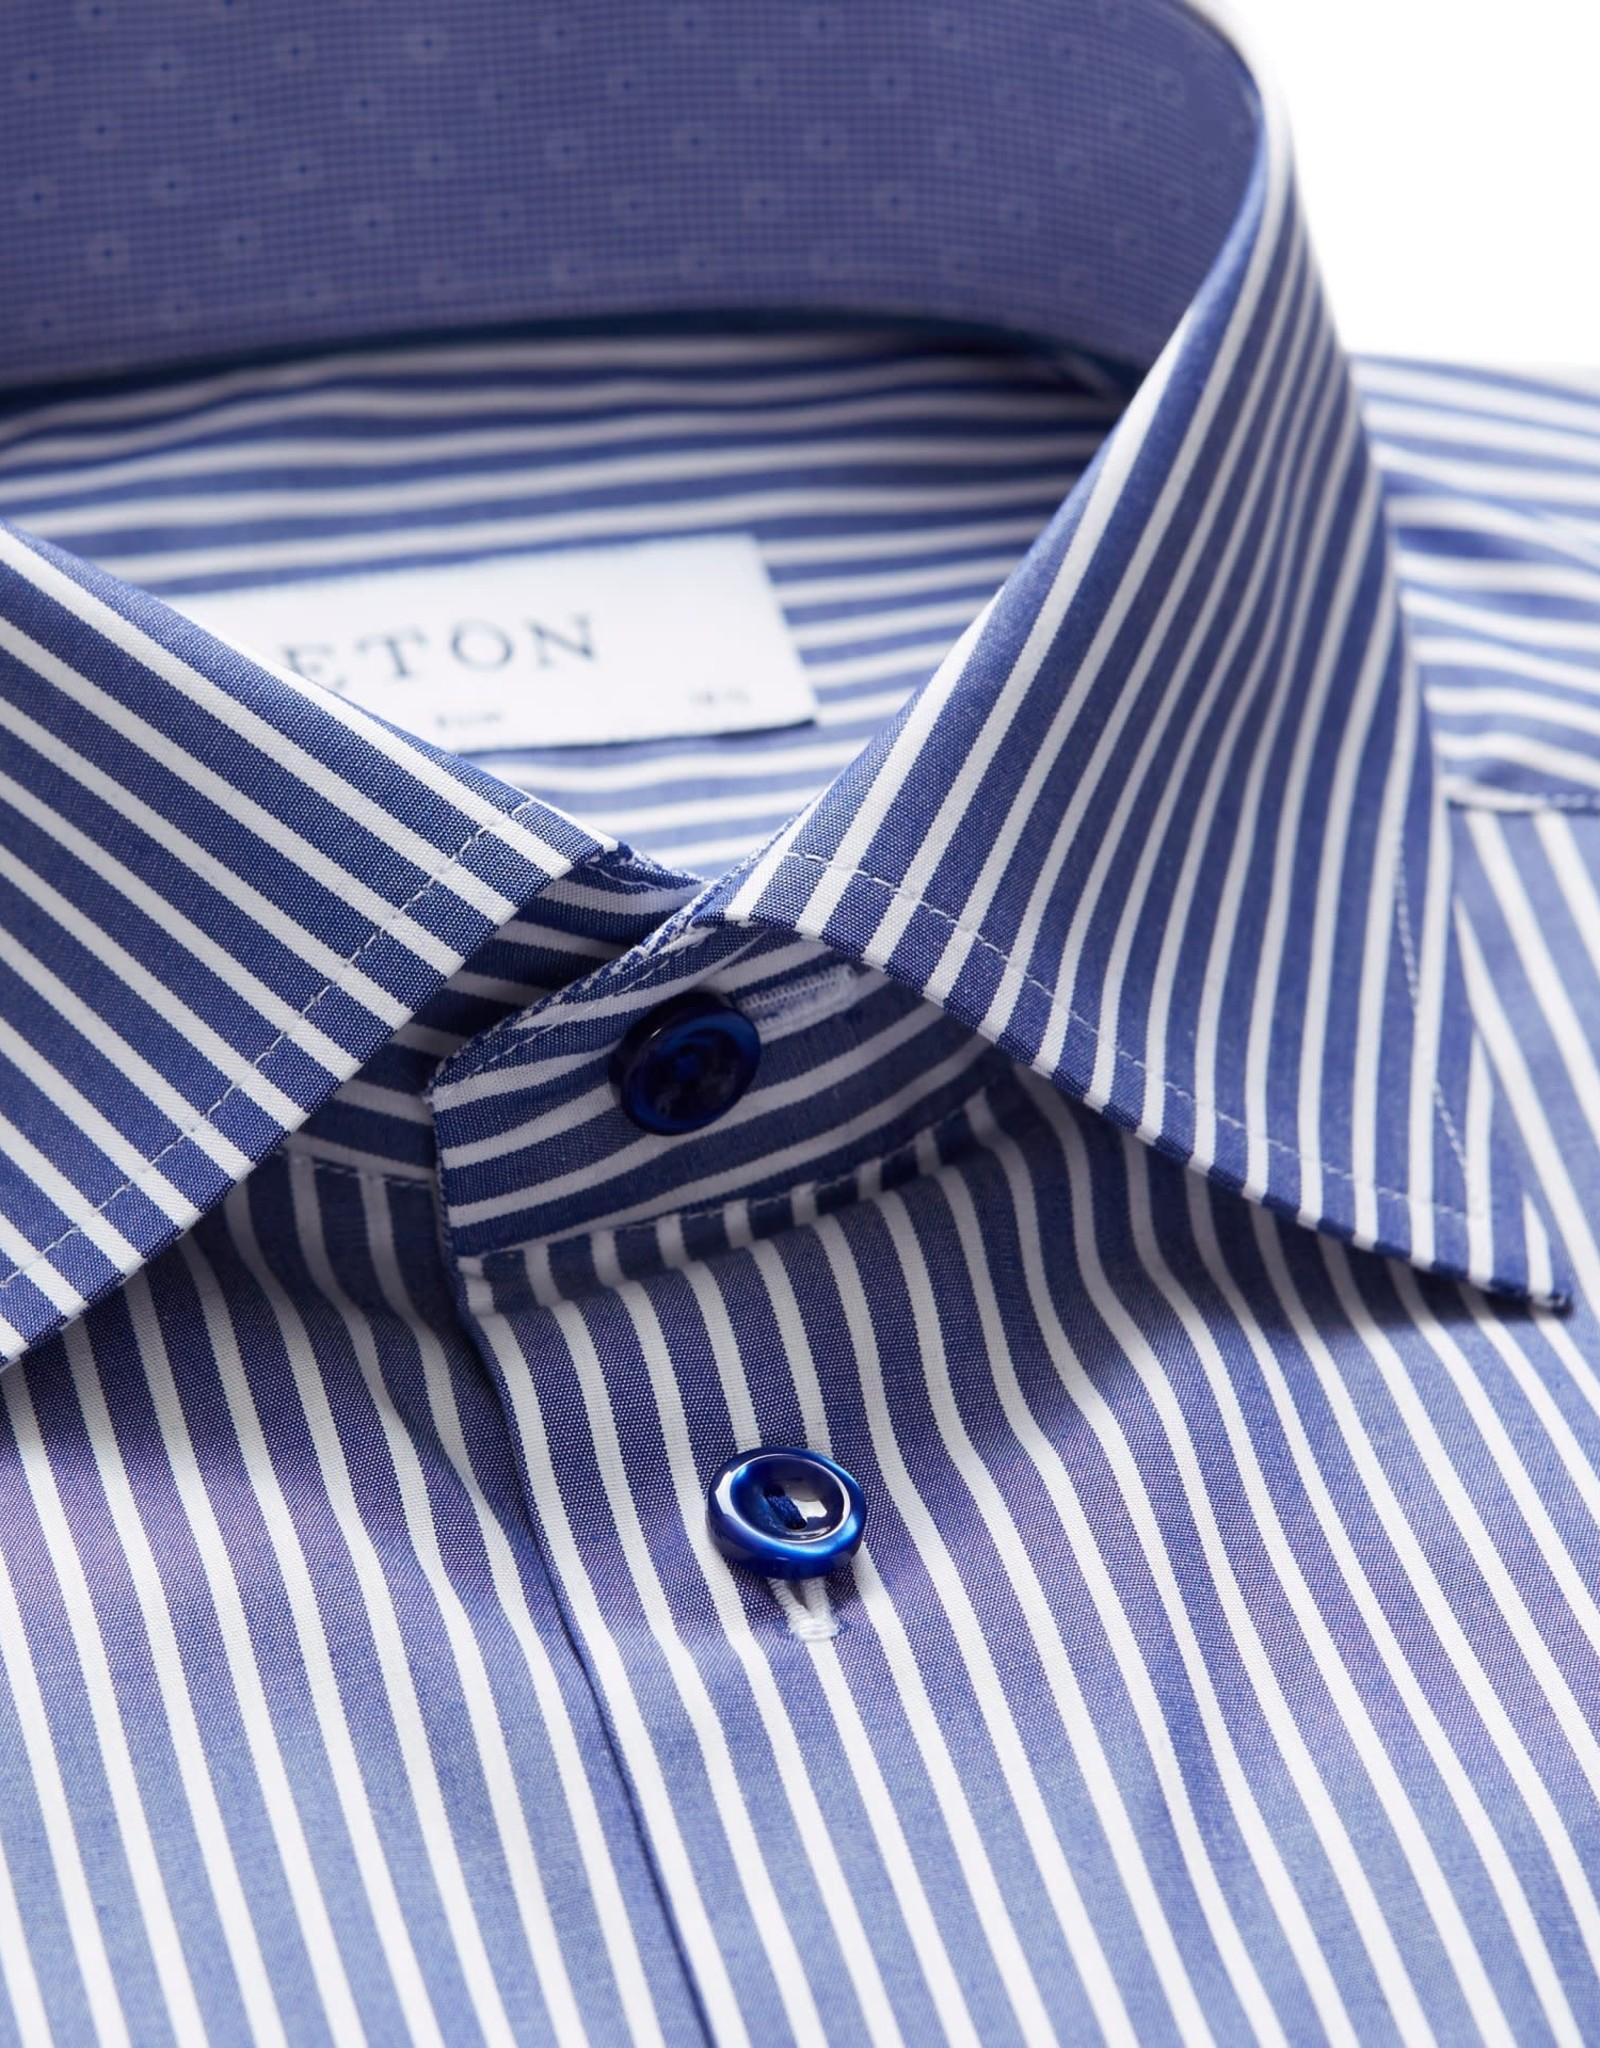 Eton Eton hemd blauw contemporary 2036-79467/25